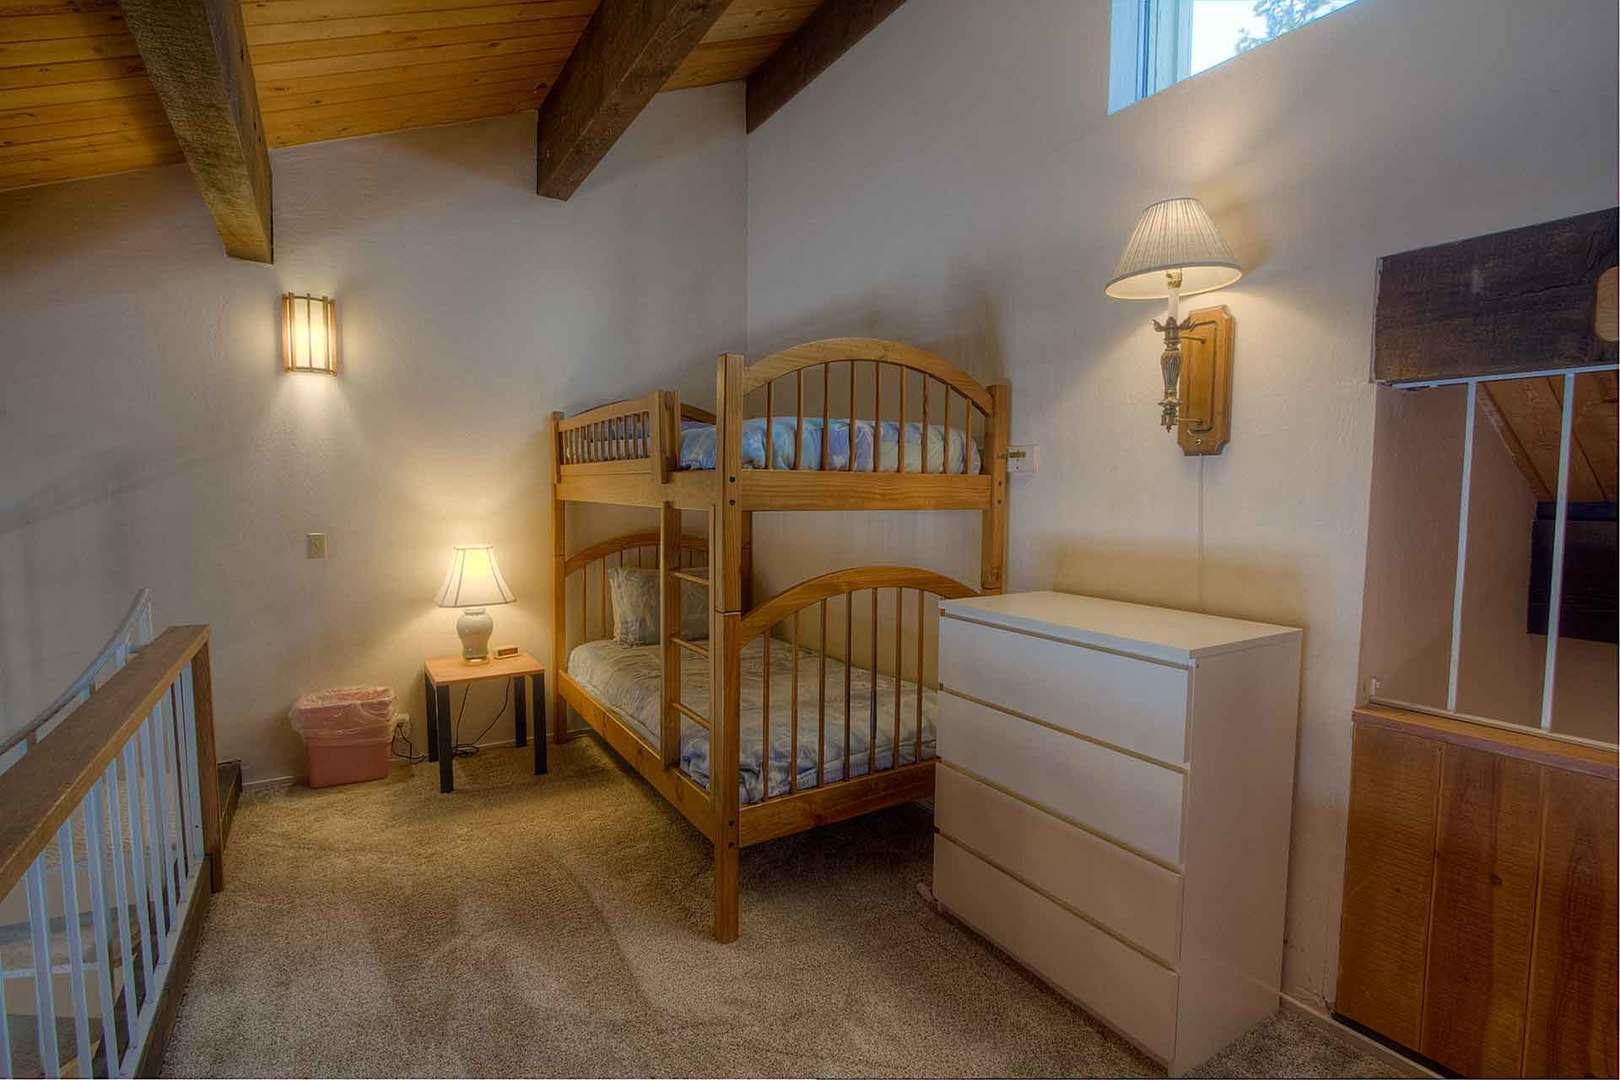 kwc1030 Loft bedroom